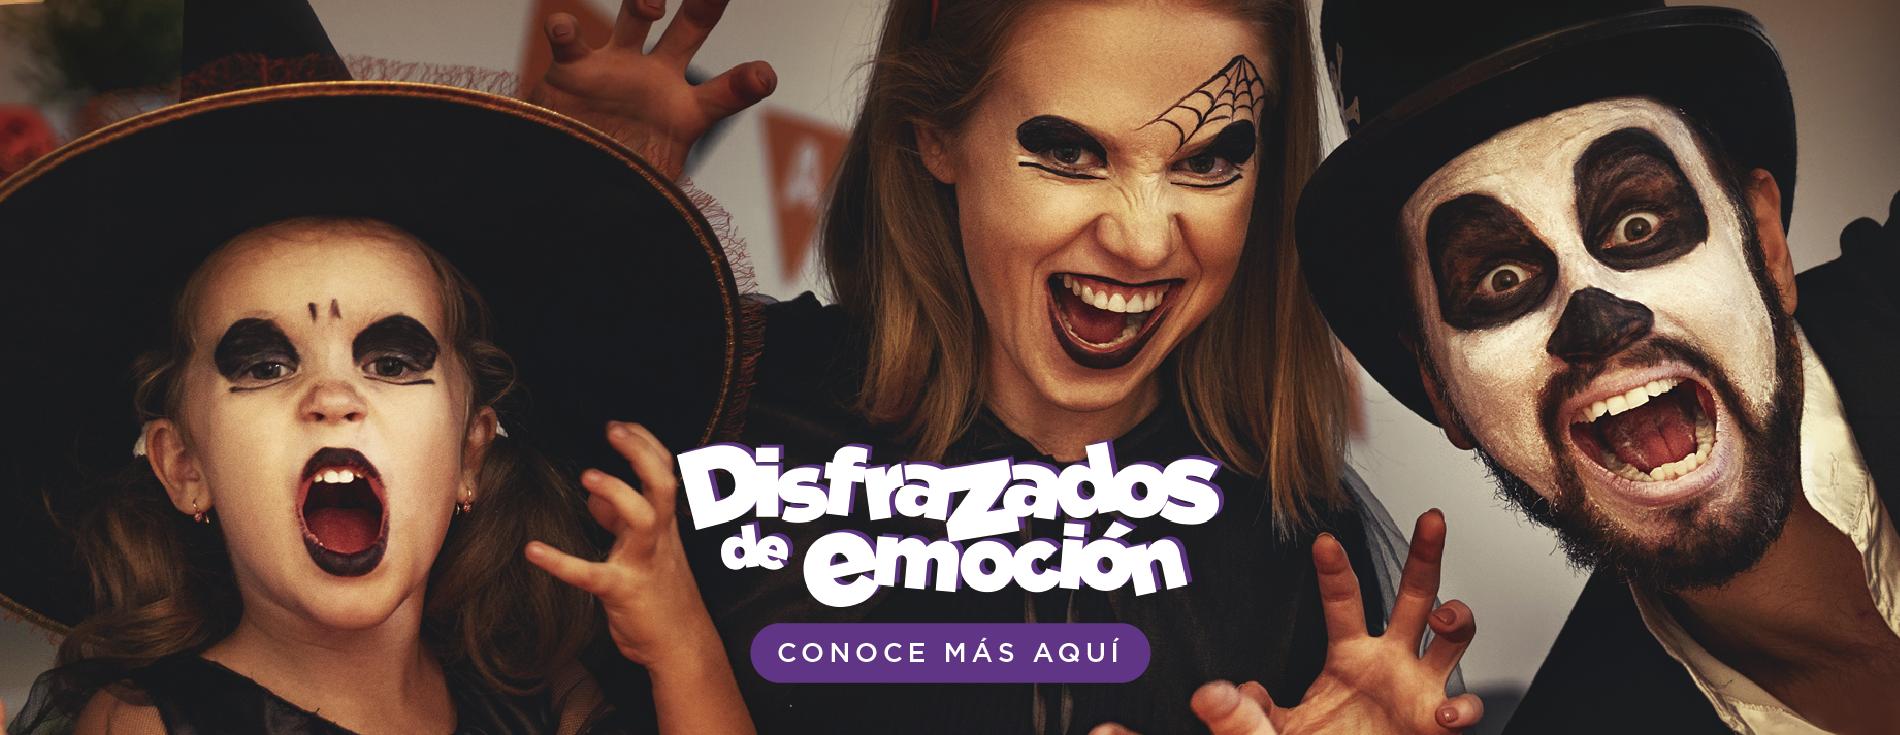 Fiesta de Halloween - La ceja